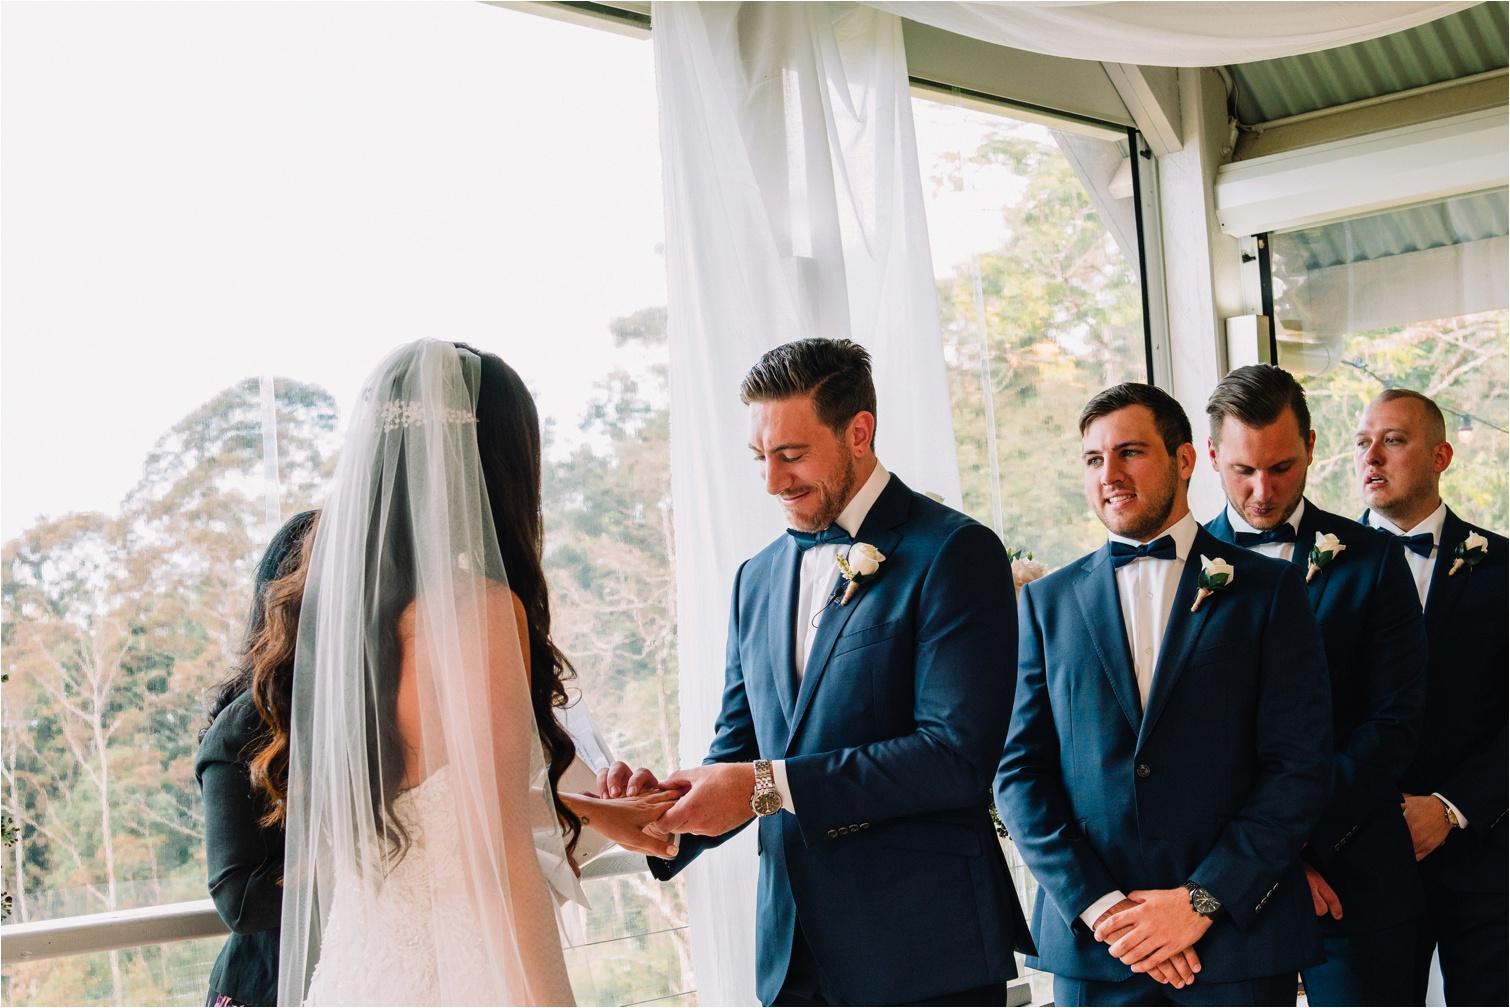 Maleny Manor Wedding Photography - Gold Coast Wedding Photographer_0026.jpg